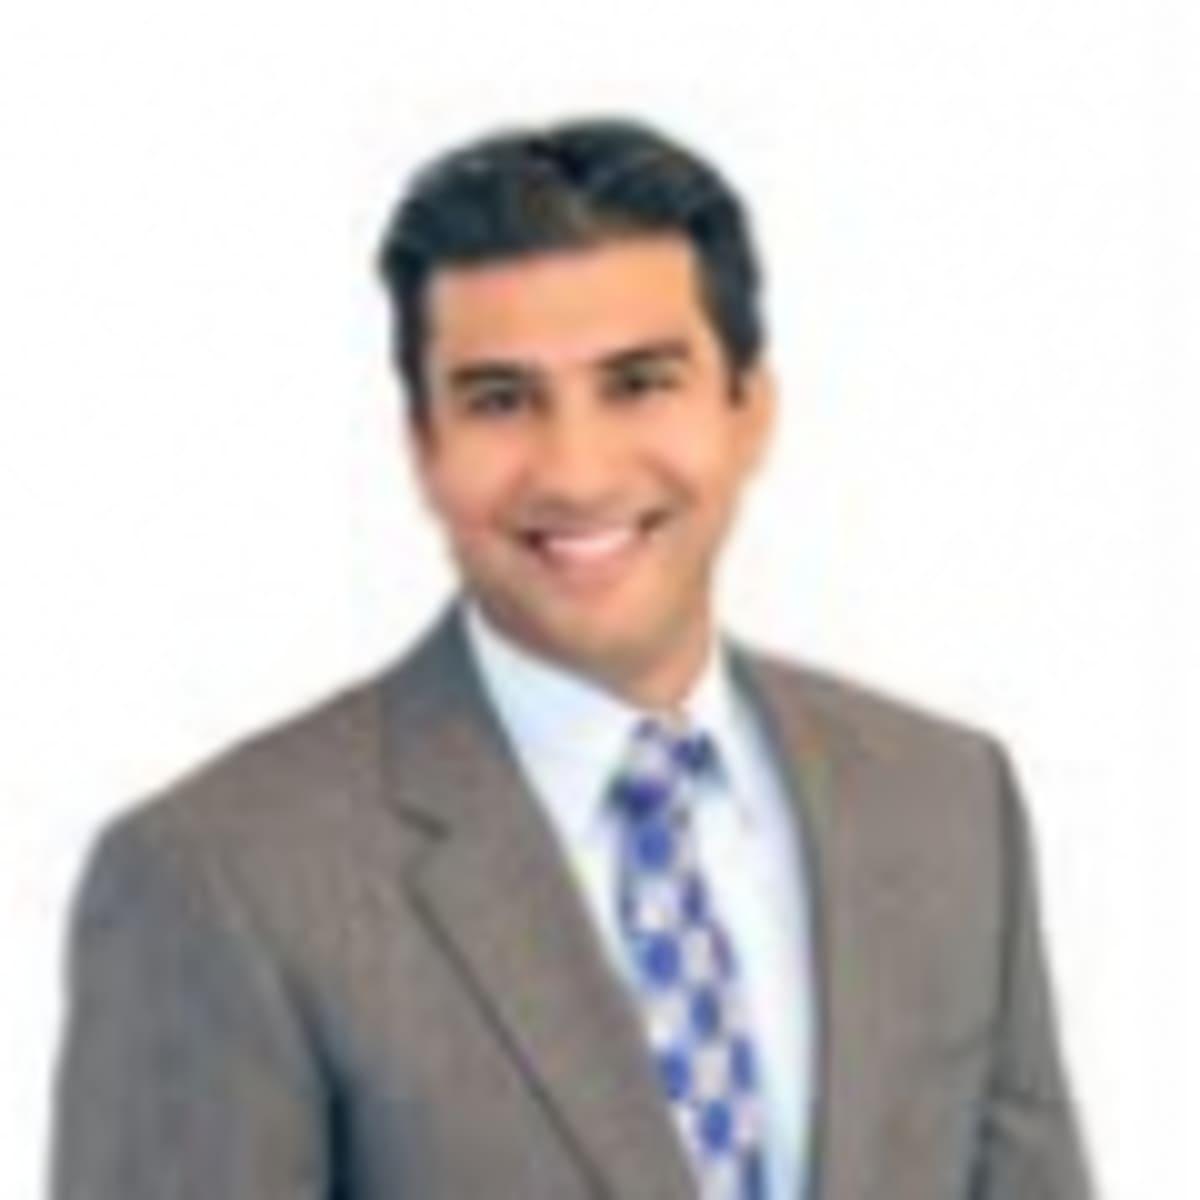 Short Sweet I Love You Quotes: Dr. Samir Shah, MD